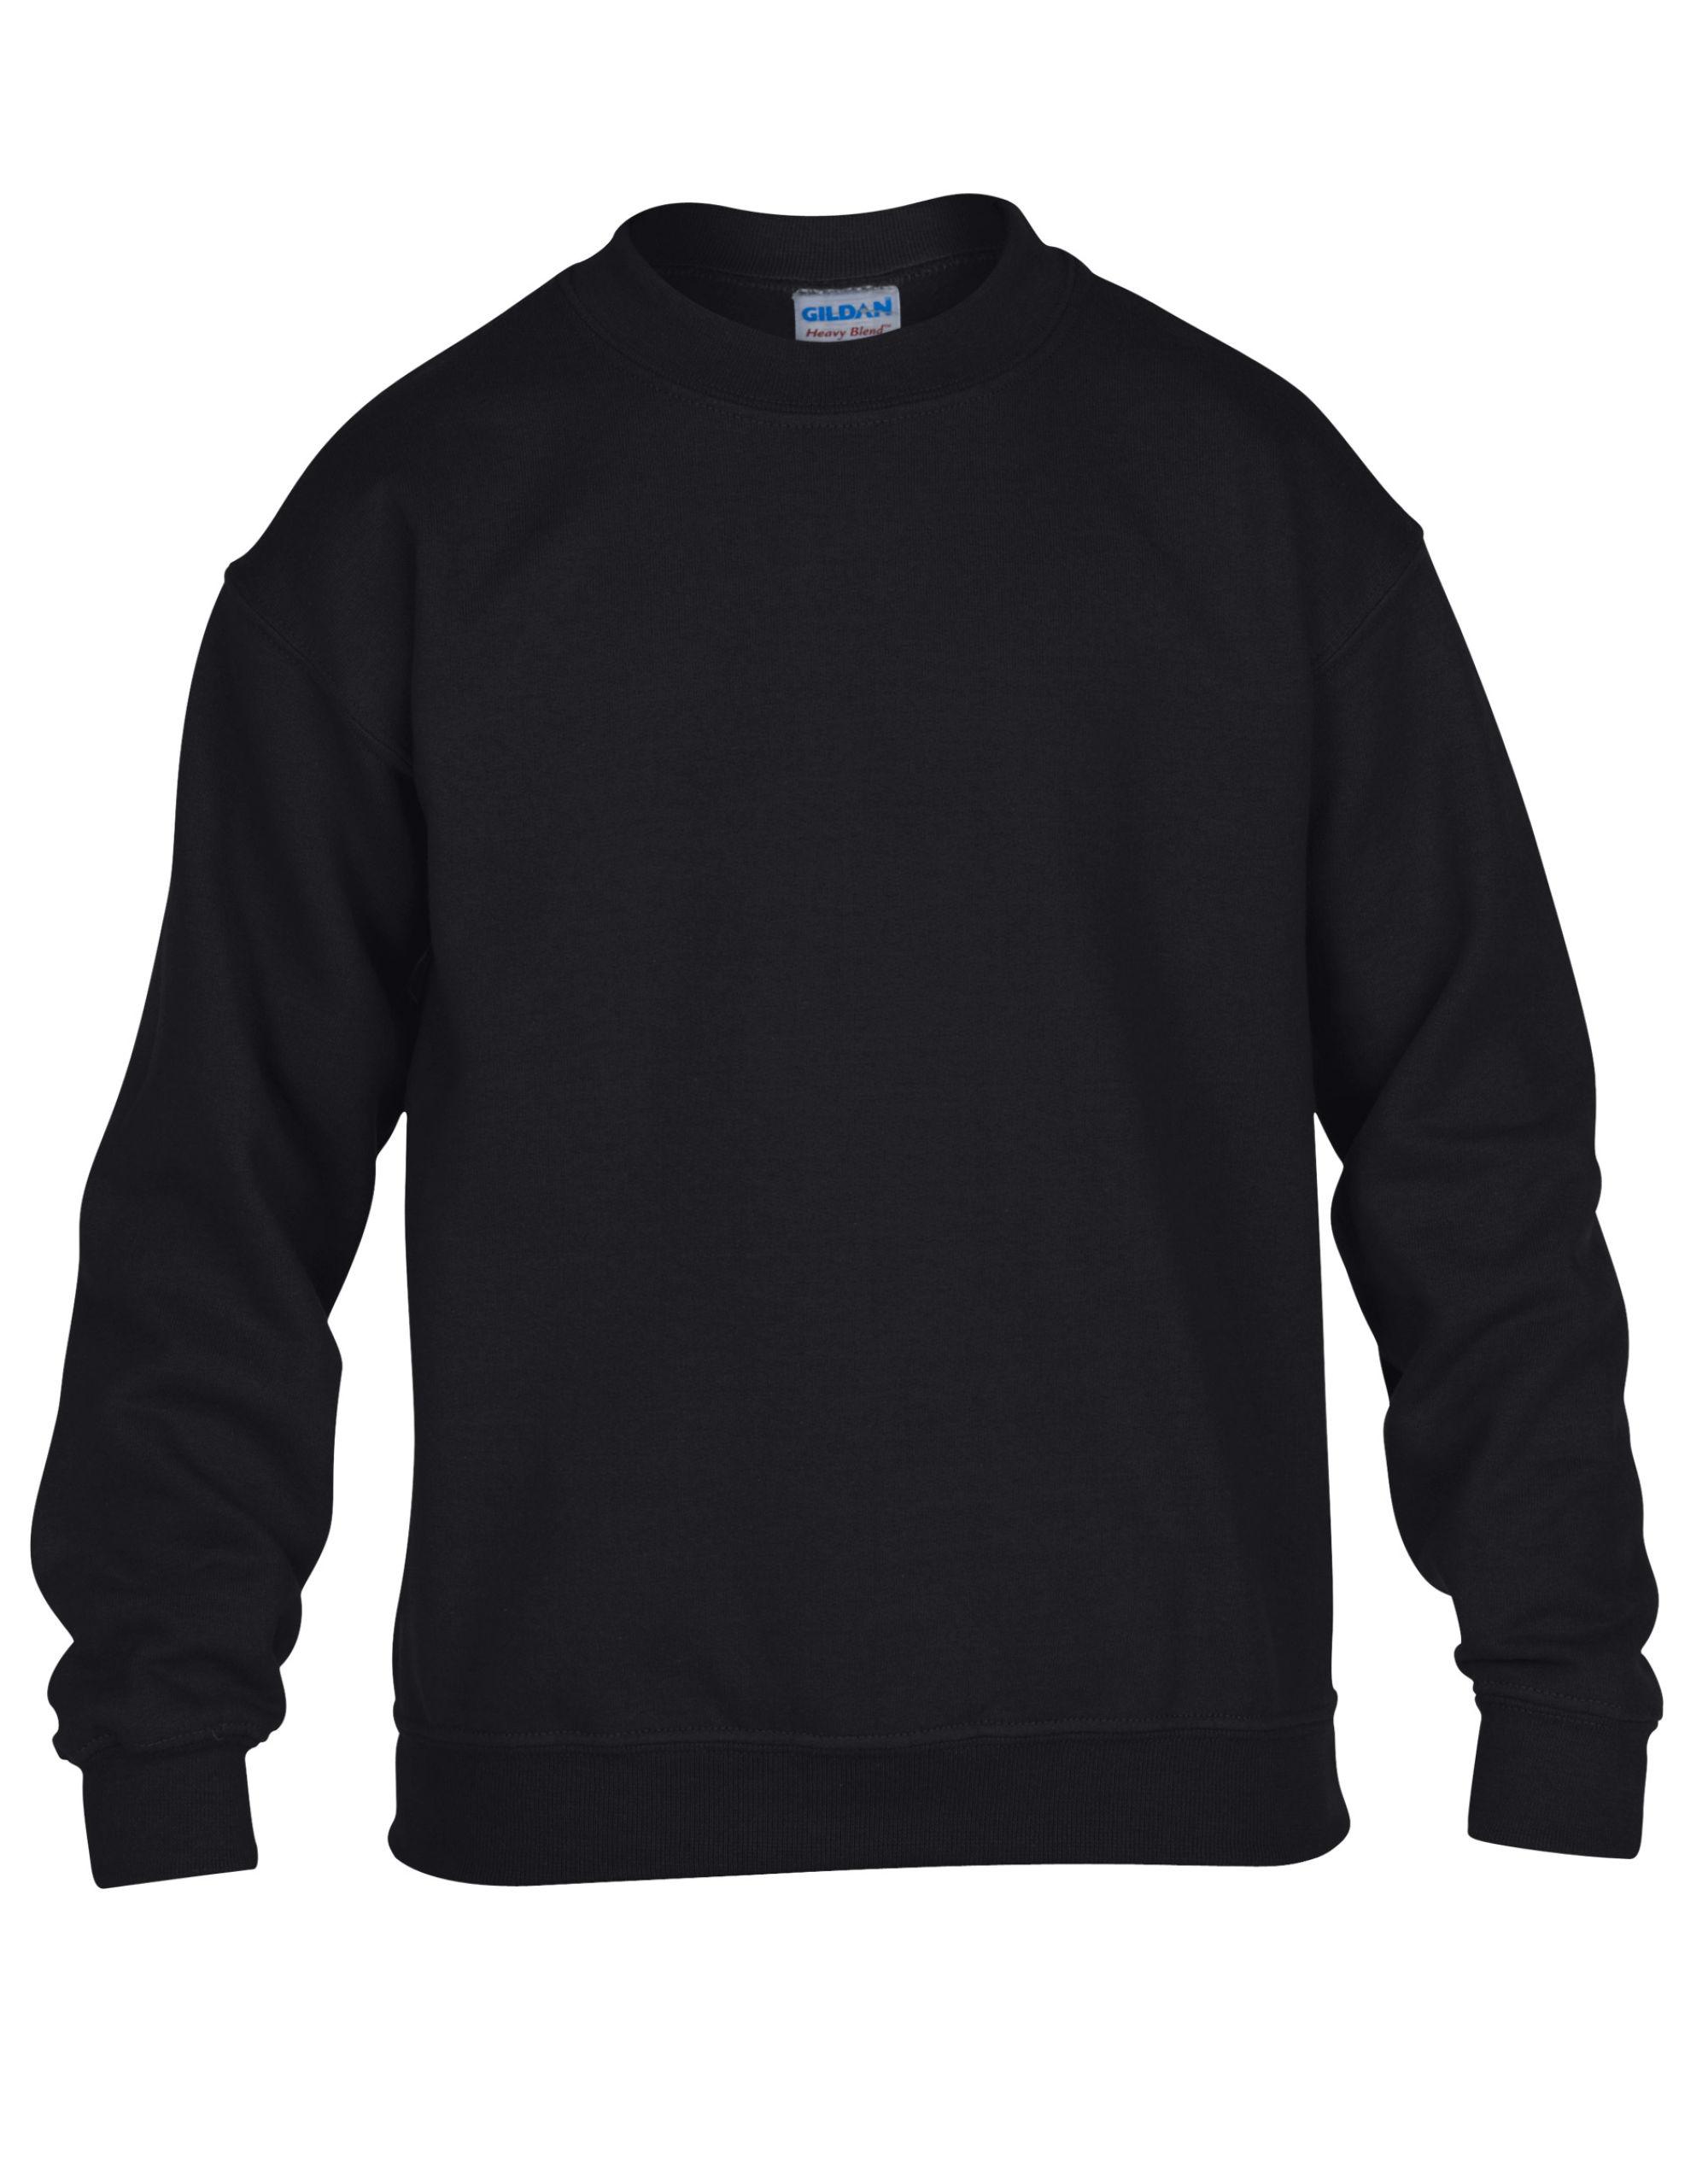 Children's Heavy Blend Crewneck Sweatshirt